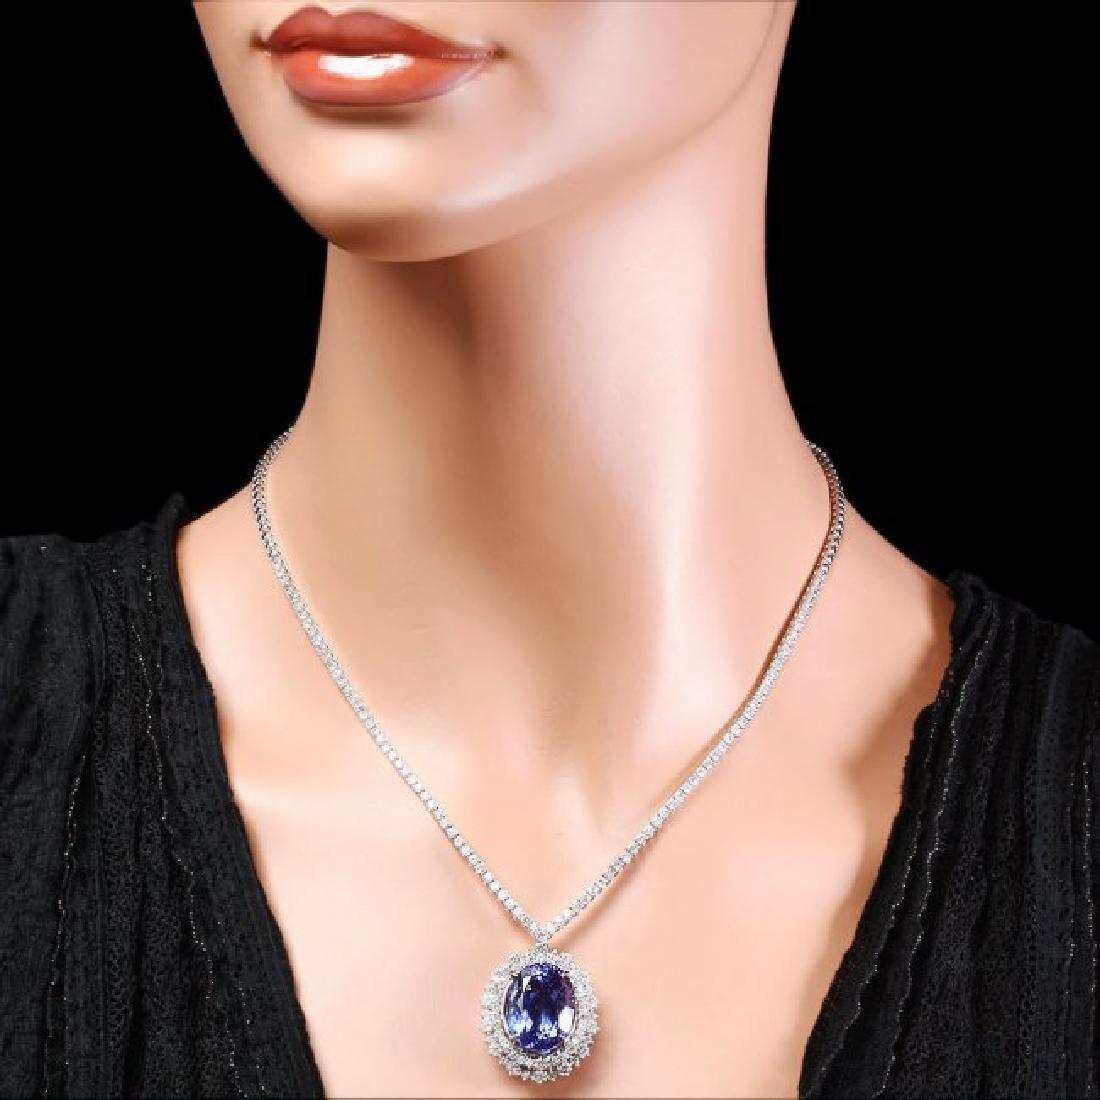 18k Gold 21ct Tanzanite 6ct Diamond Necklace - 5